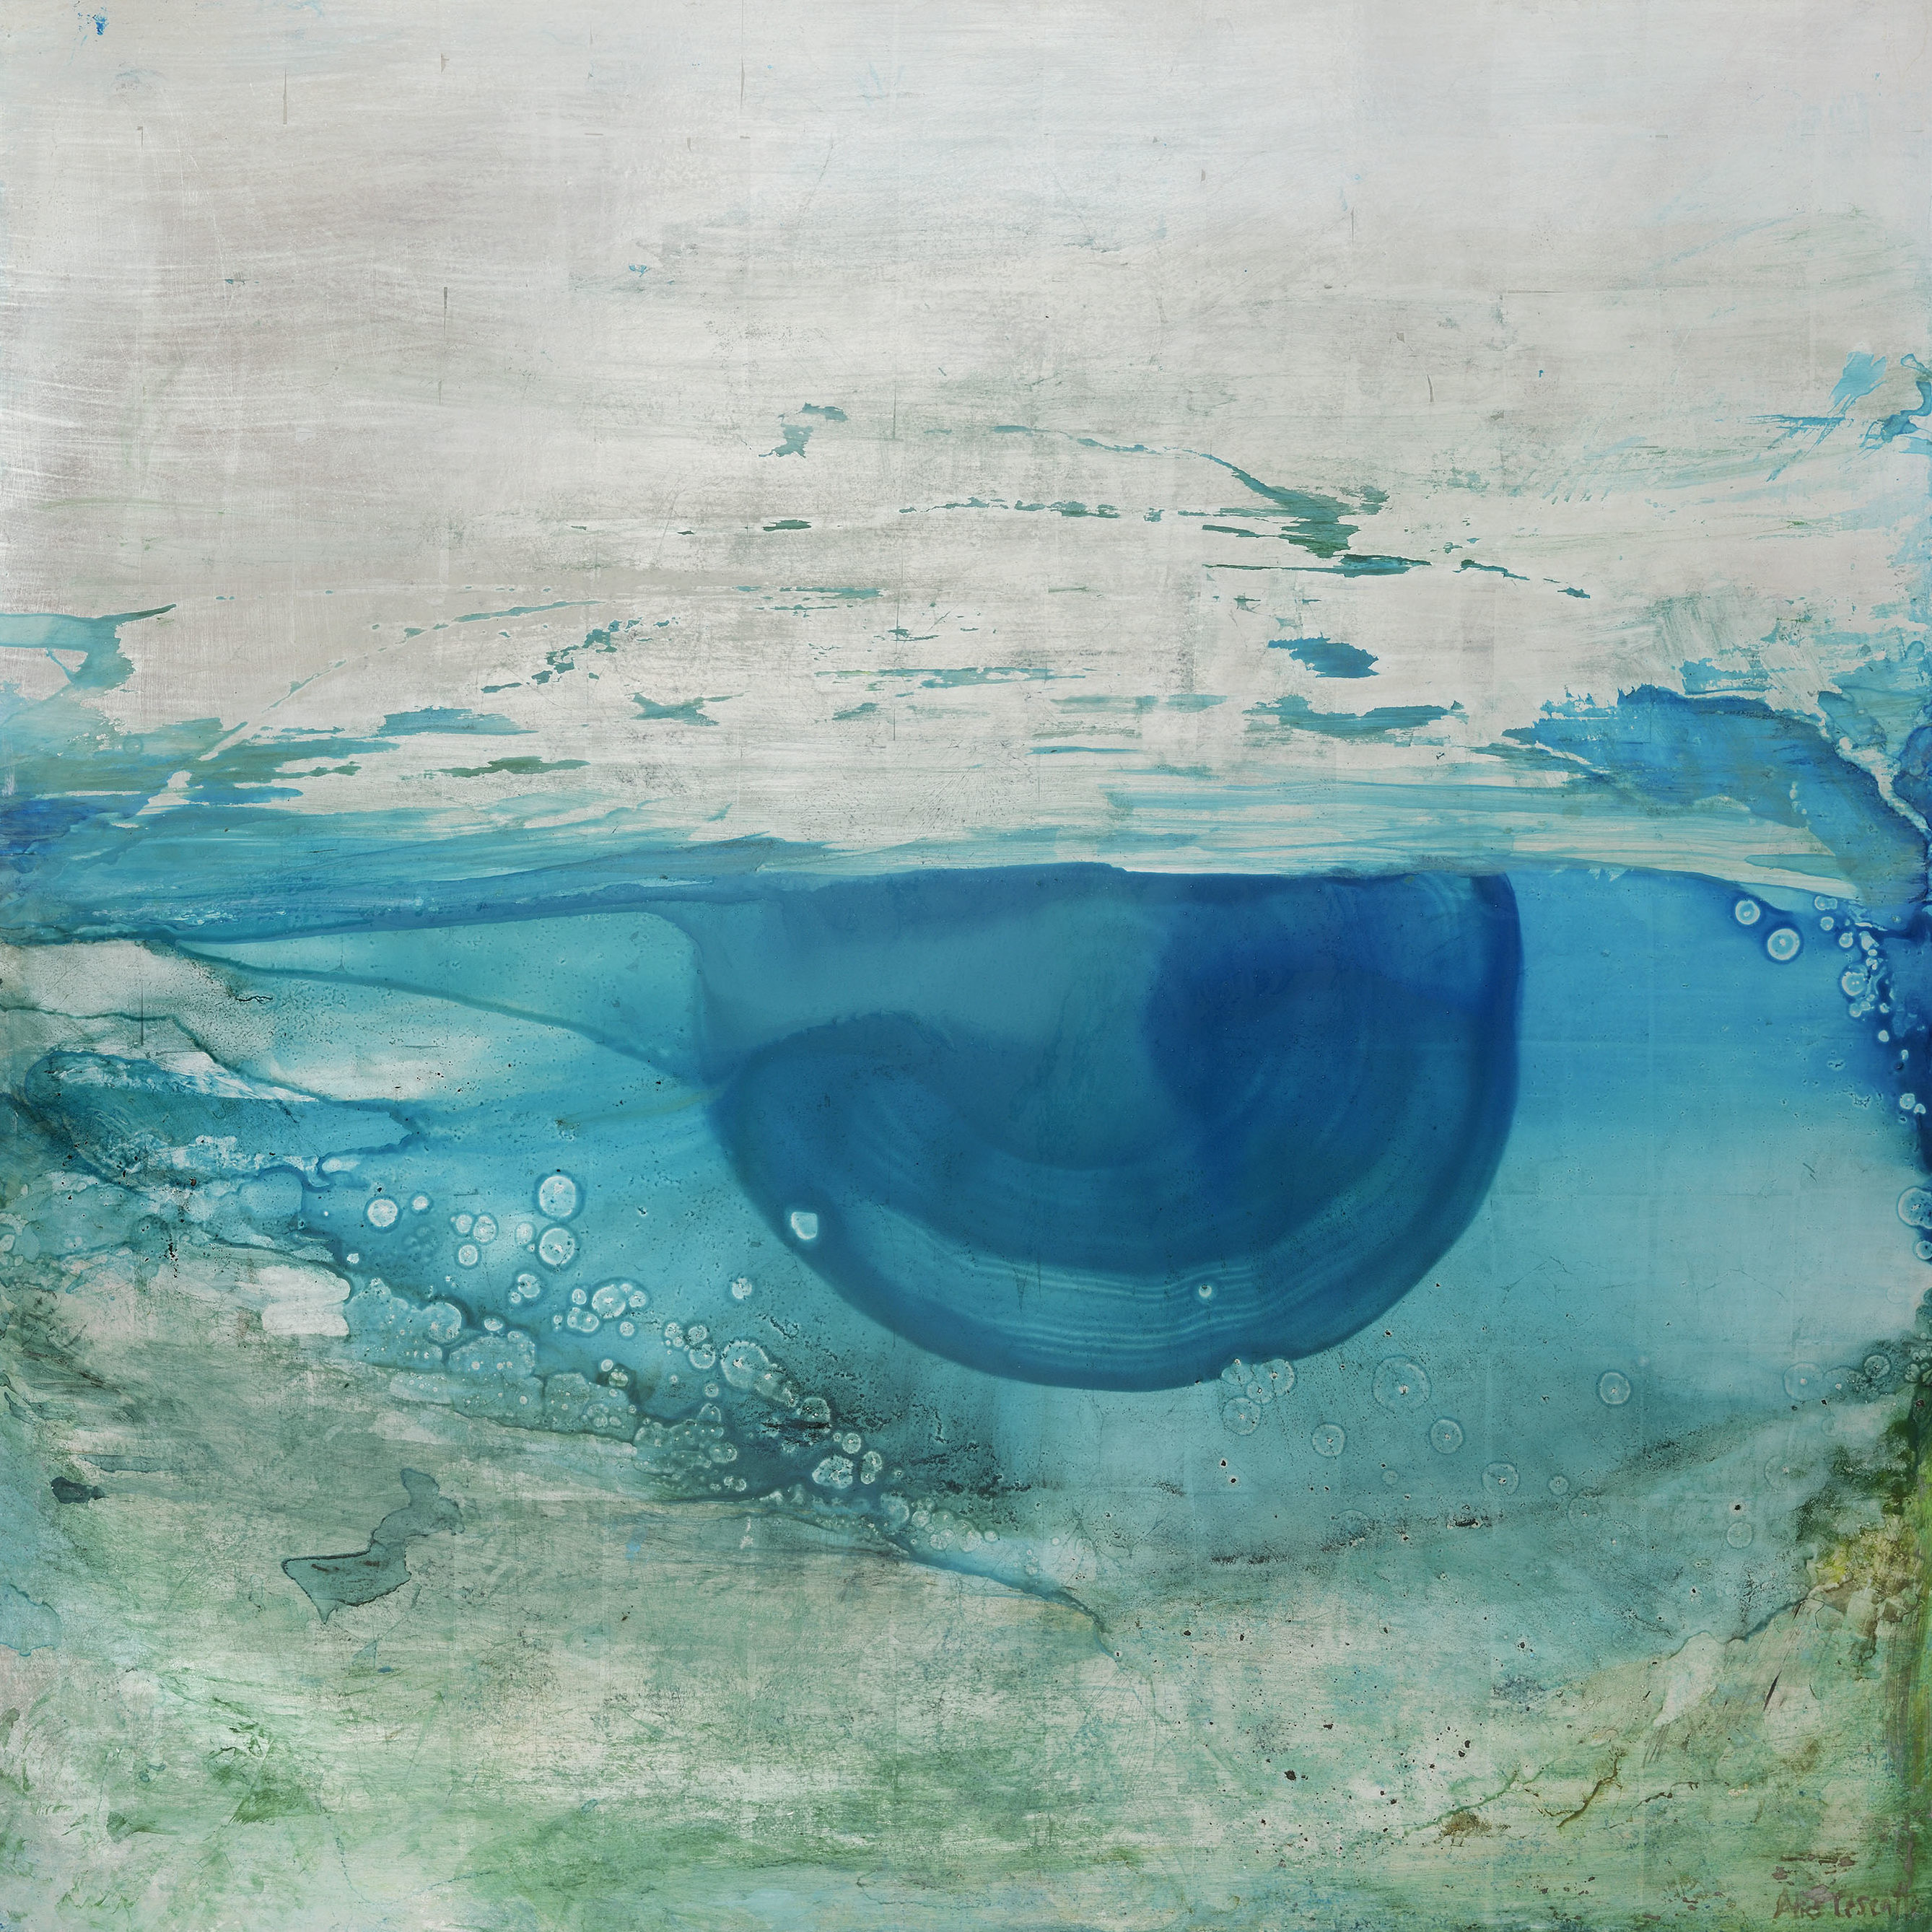 Ocean Drop 1 by Alice Cescatti